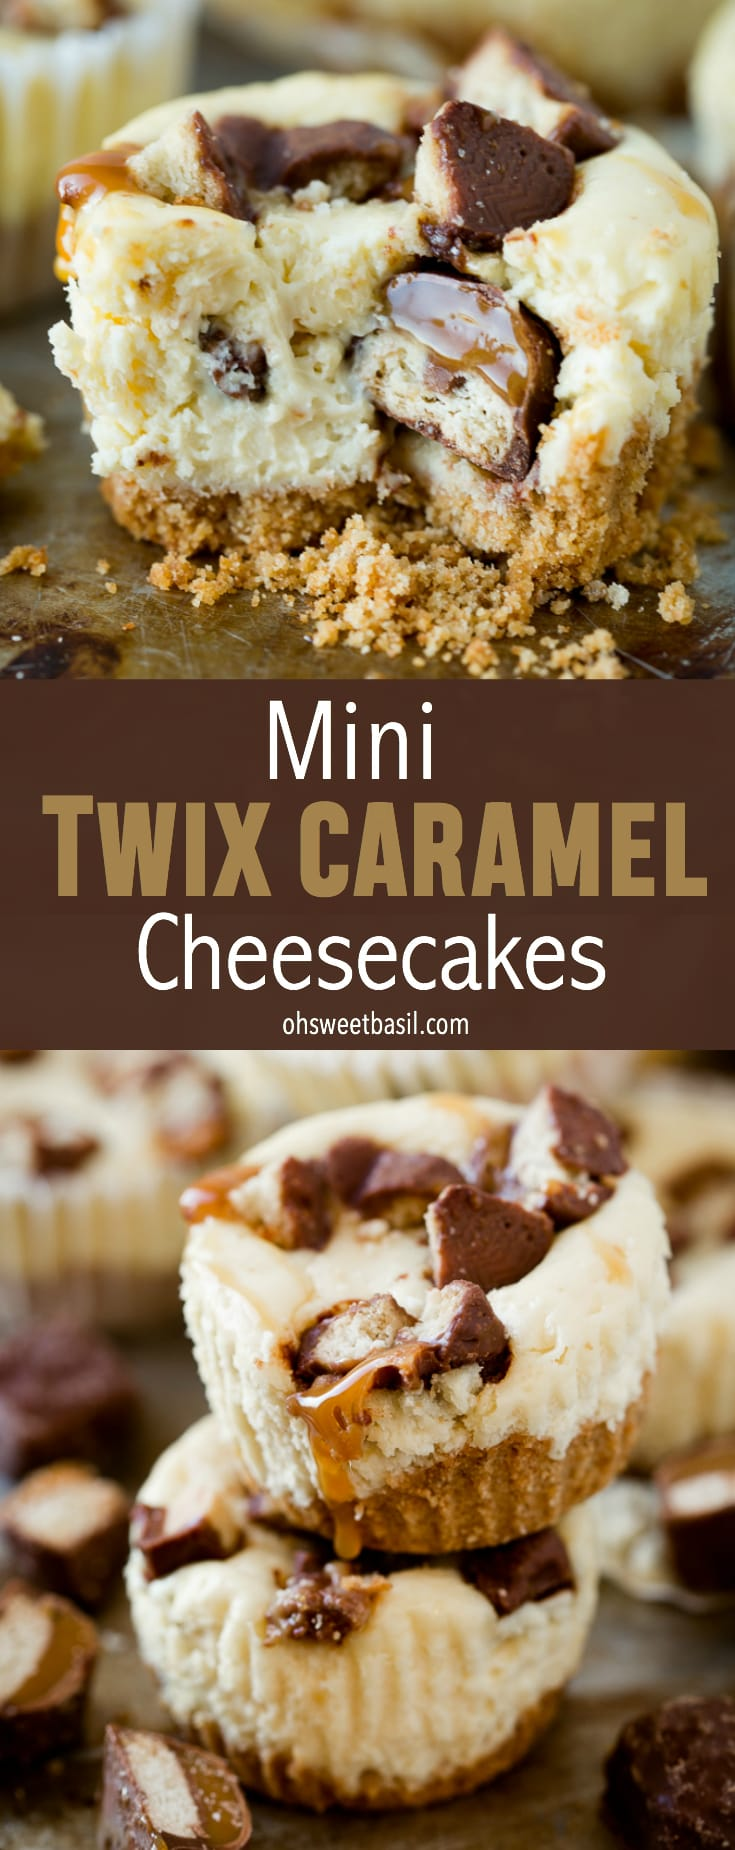 Mini Twix Caramel Cheesecakes